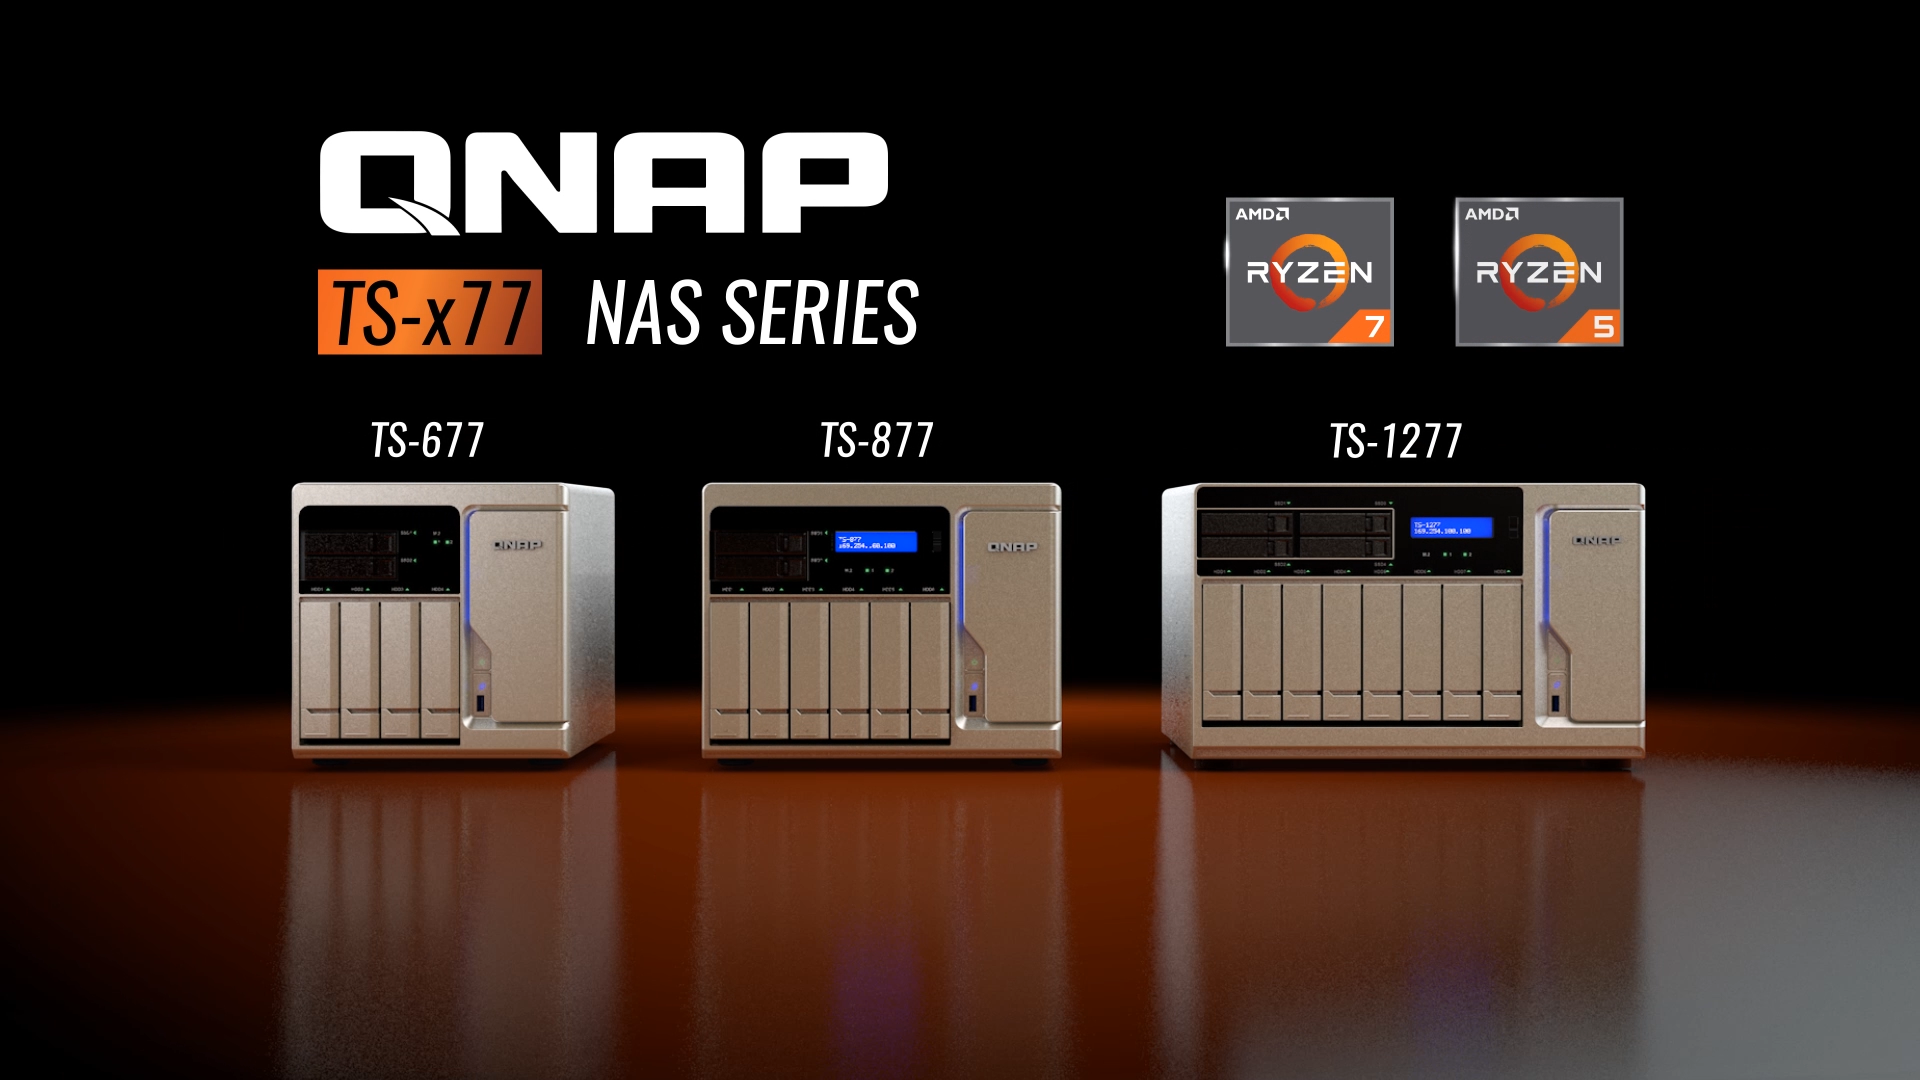 QNAP TS-x77 World's first Ryzen NAS